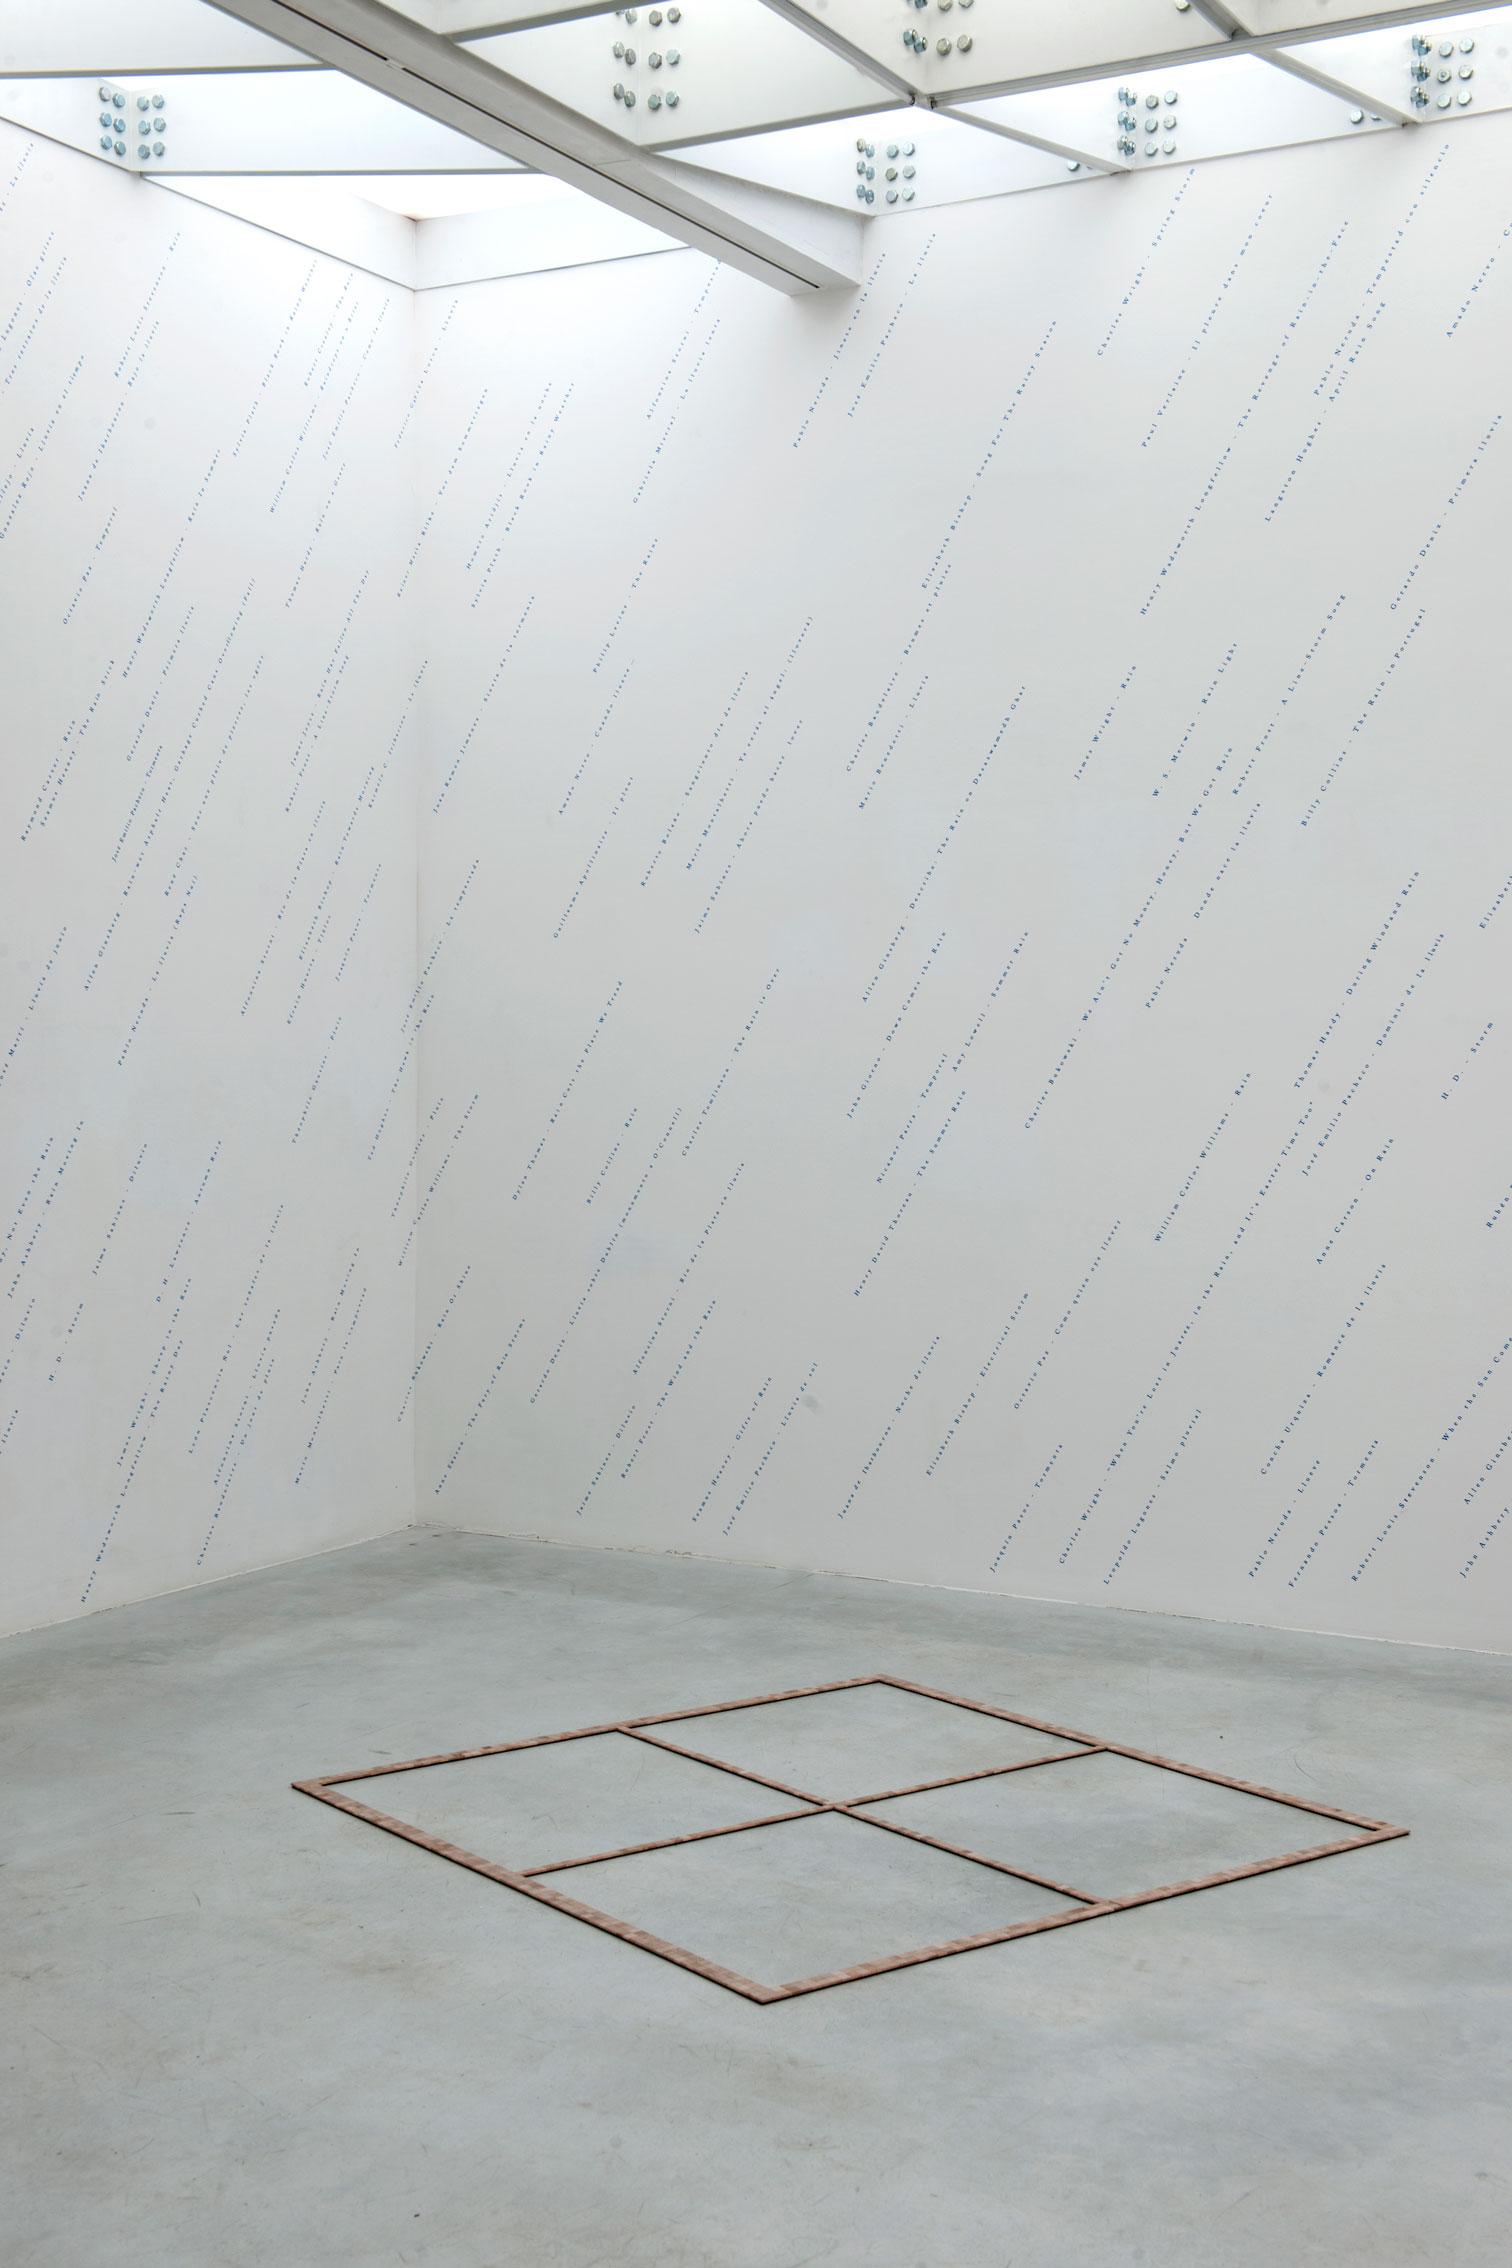 Está lloviendo (una antología)/It's Raining (An Anthology),   2017  Vinil / Vinyl  Dimensiones variables / Dimensions variable  ***    Palabra / Ventana II  /  Word / Window II,   2017  Madera, fichas de scrabble / Wood, scrabble tiles  0,5 x 155 x 155 cm